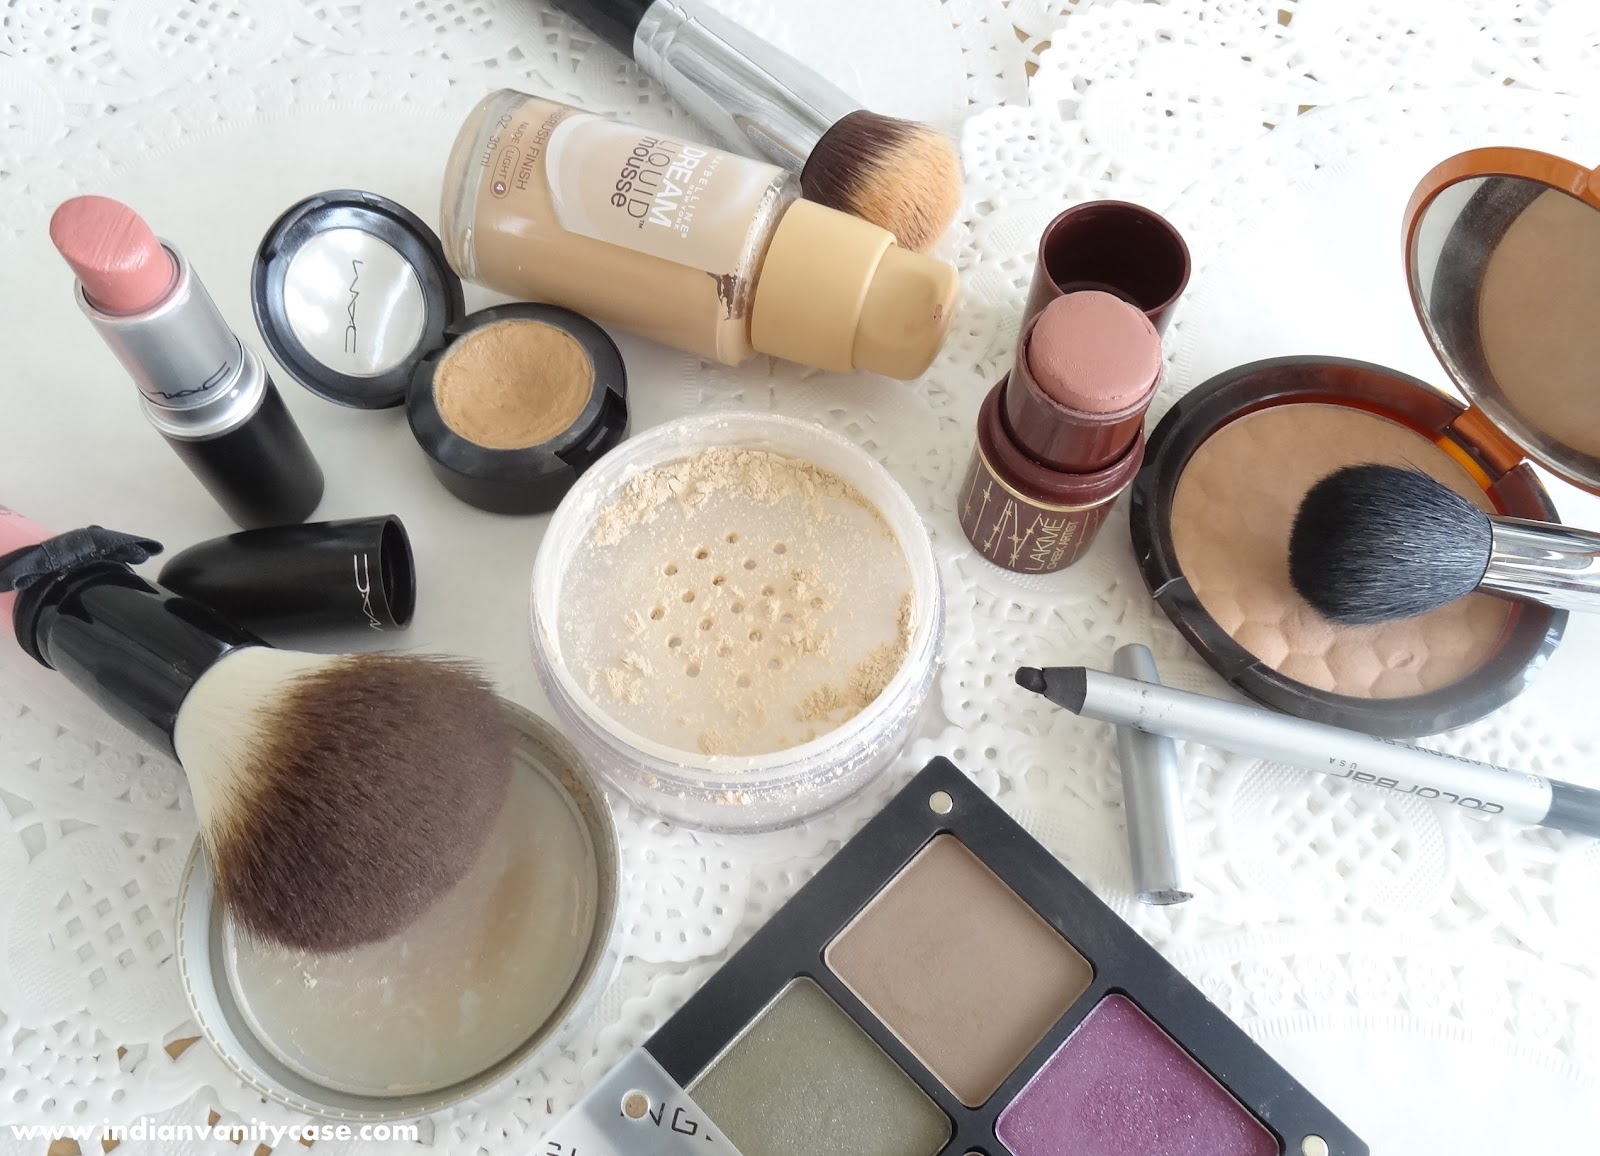 Средства для макияжа в домашних условиях 455